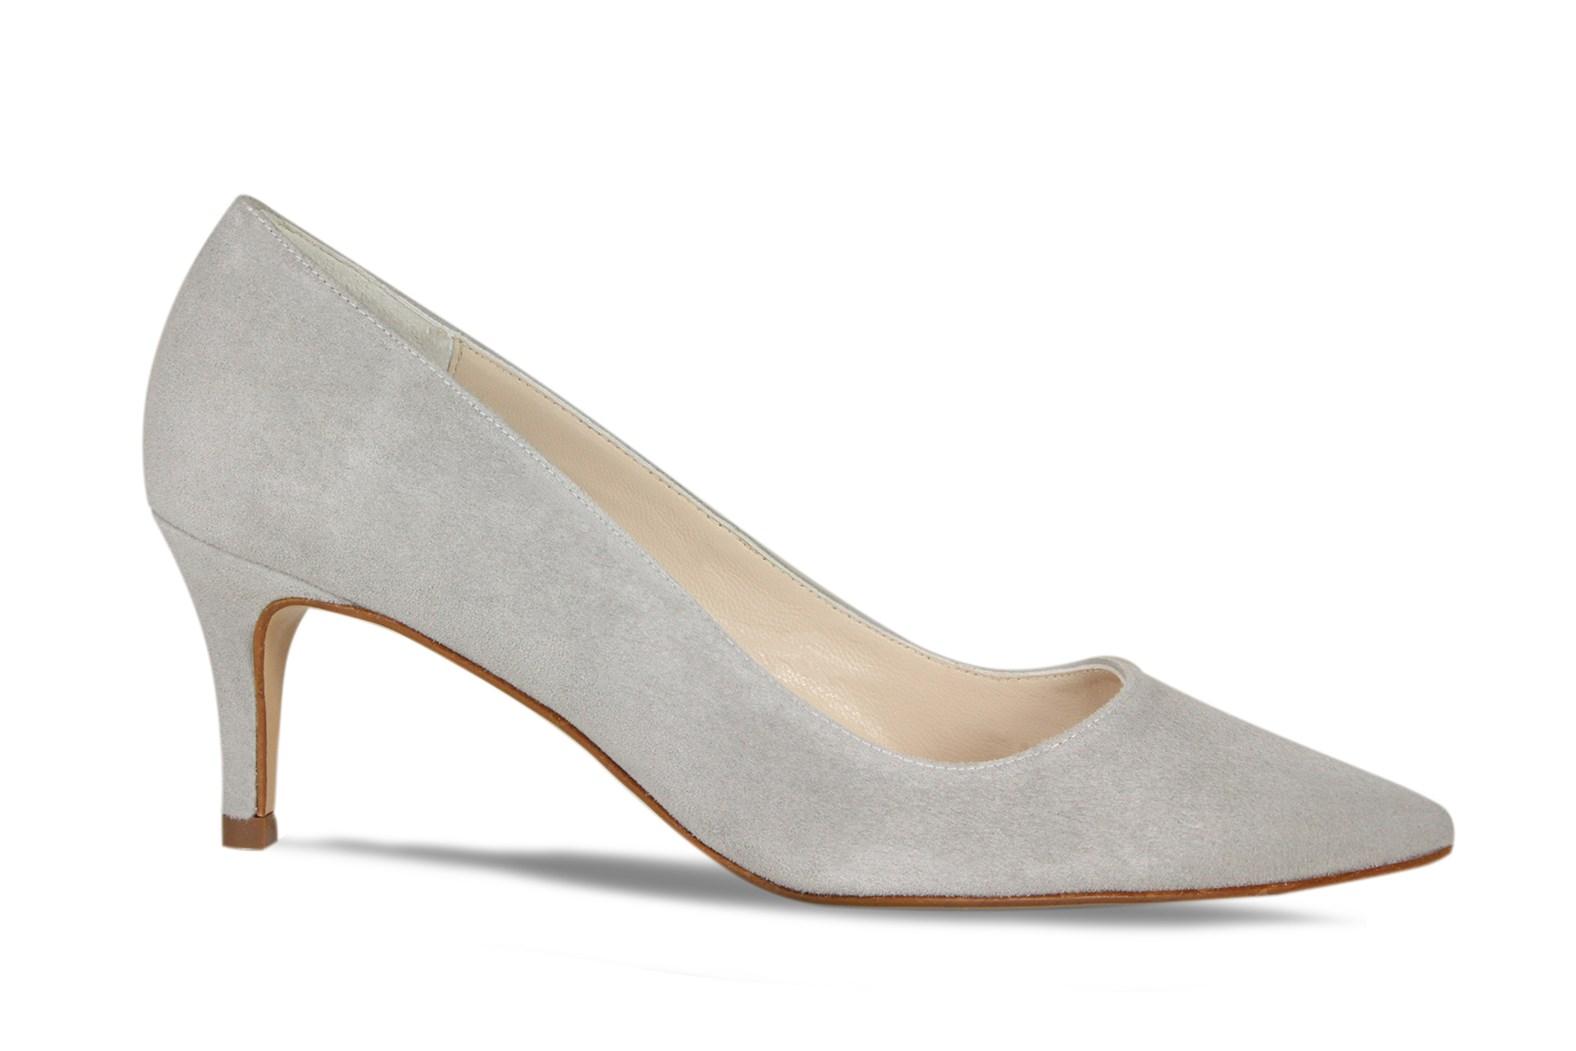 Lisa Kay Jacqui Pale Grey Suede Court Shoe